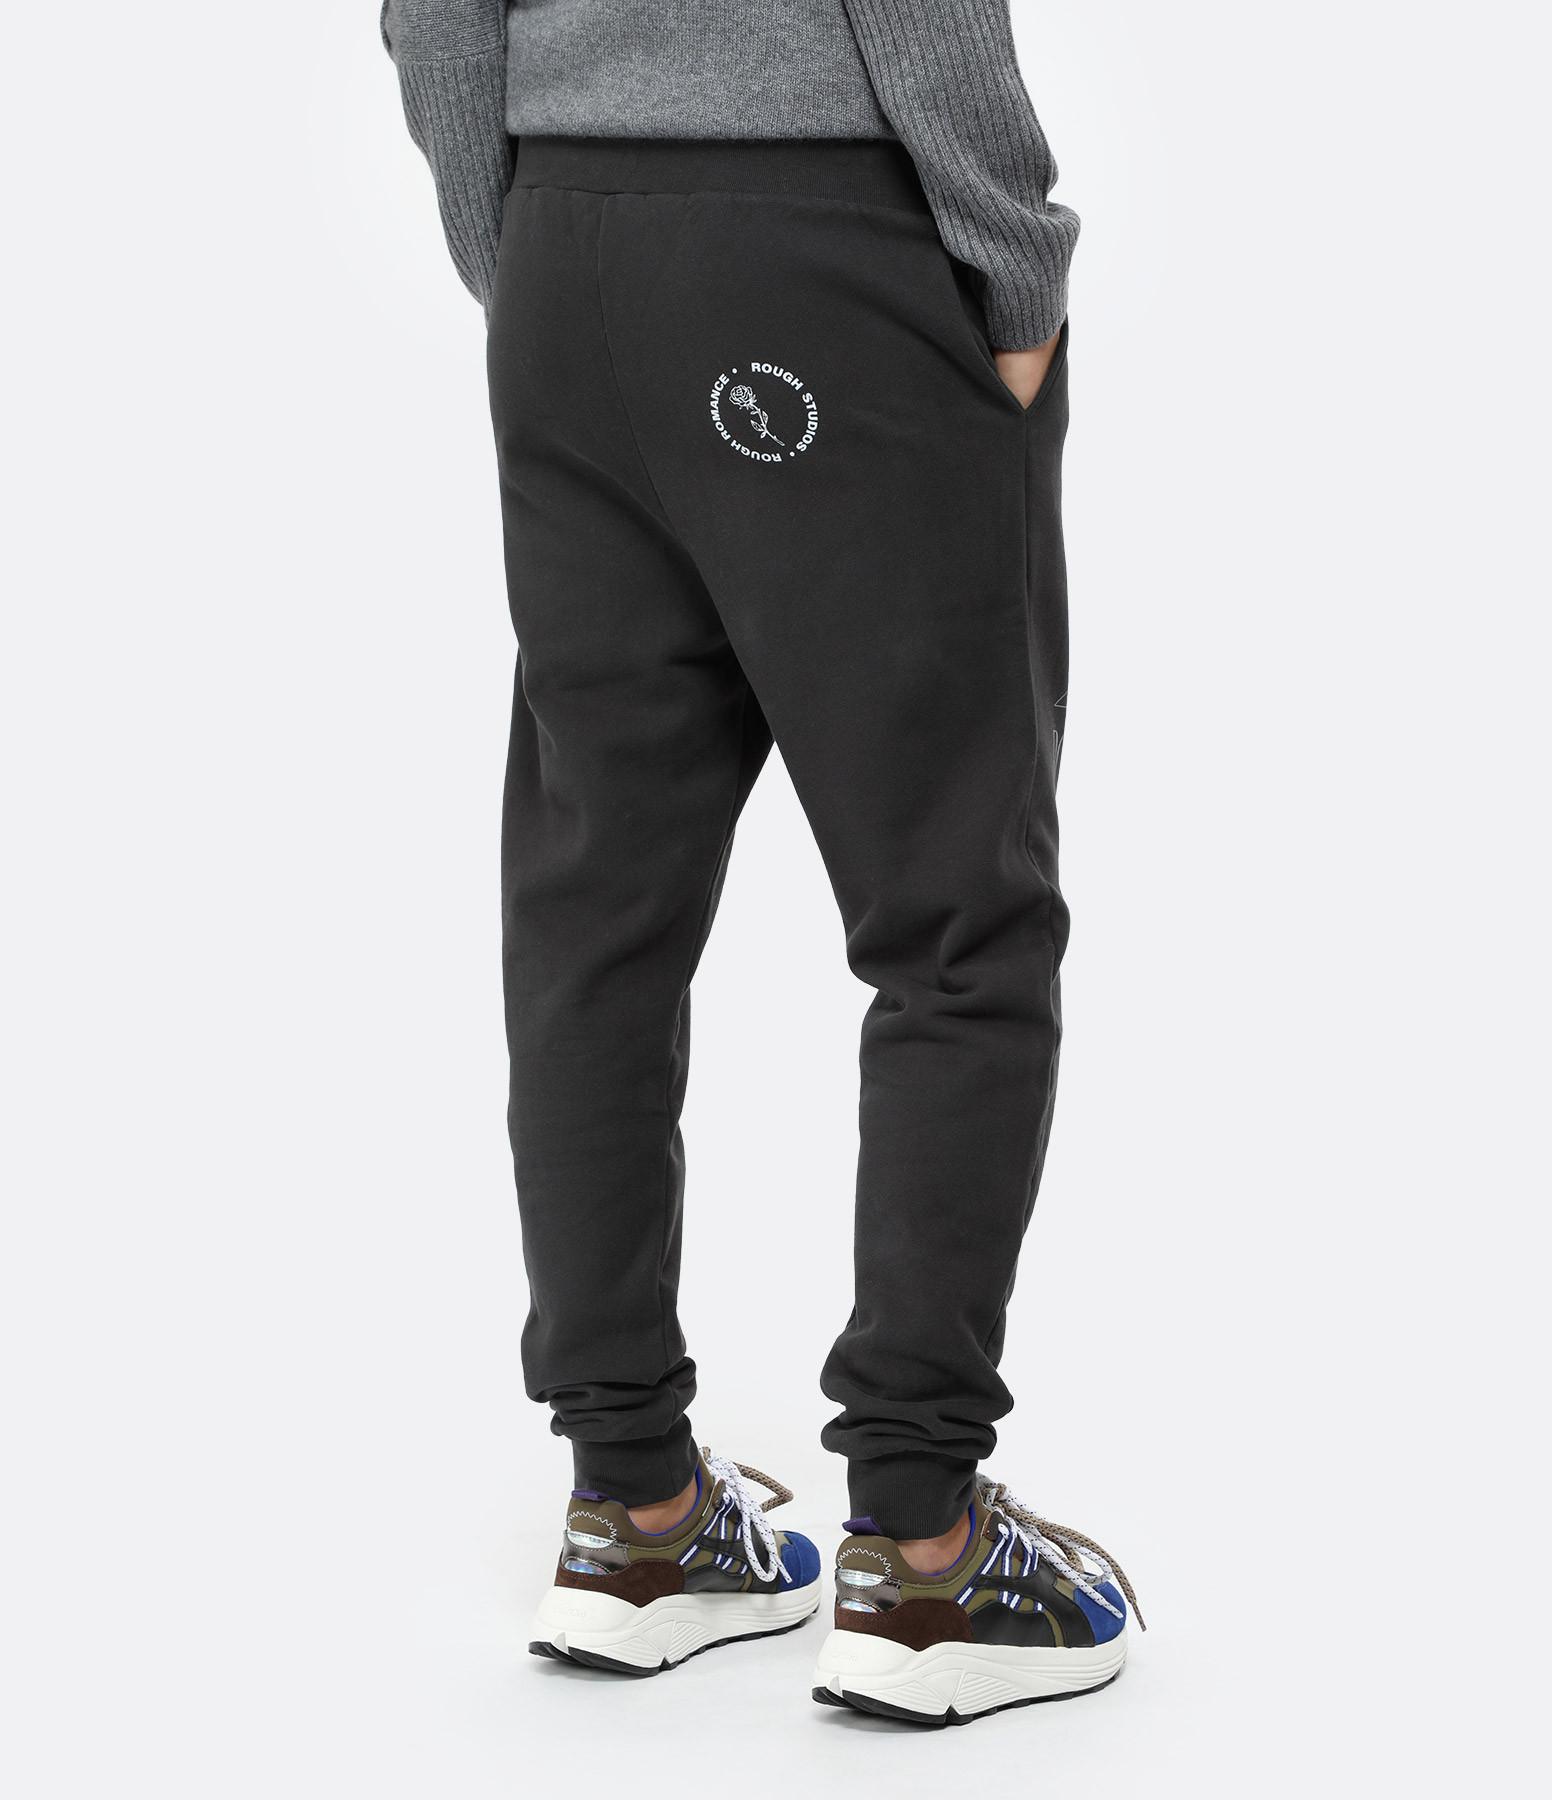 ROUGH STUDIOS - Pantalon Poppy Coton Gris